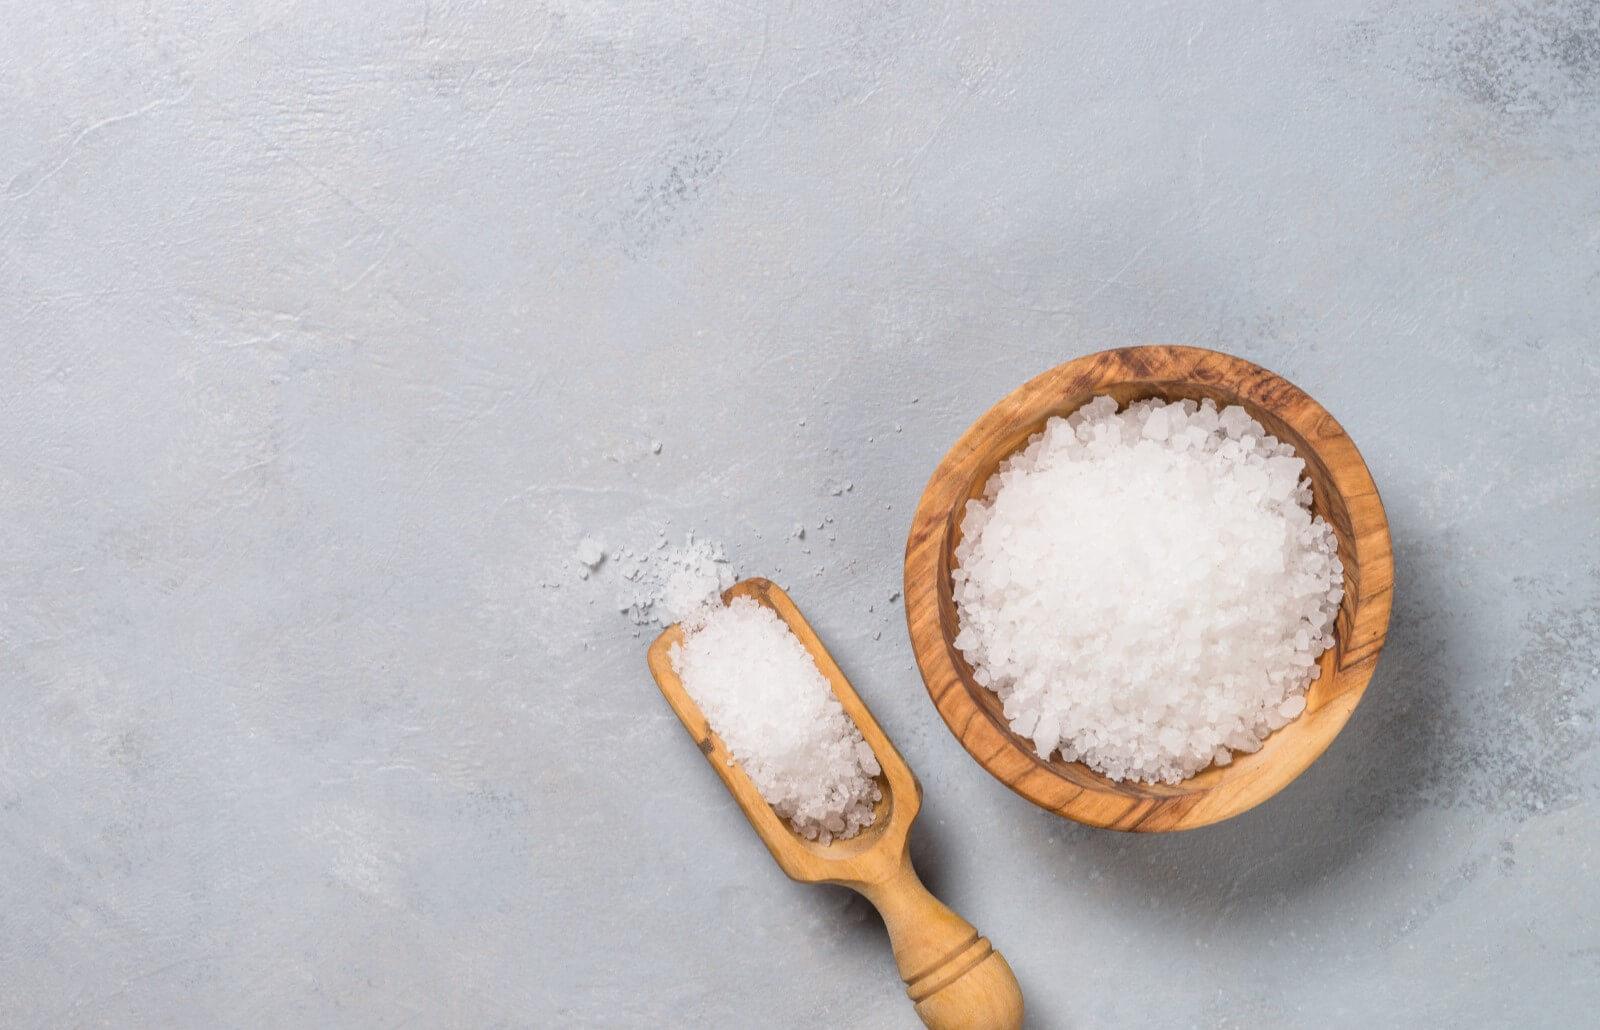 Sea Salt for the Skin